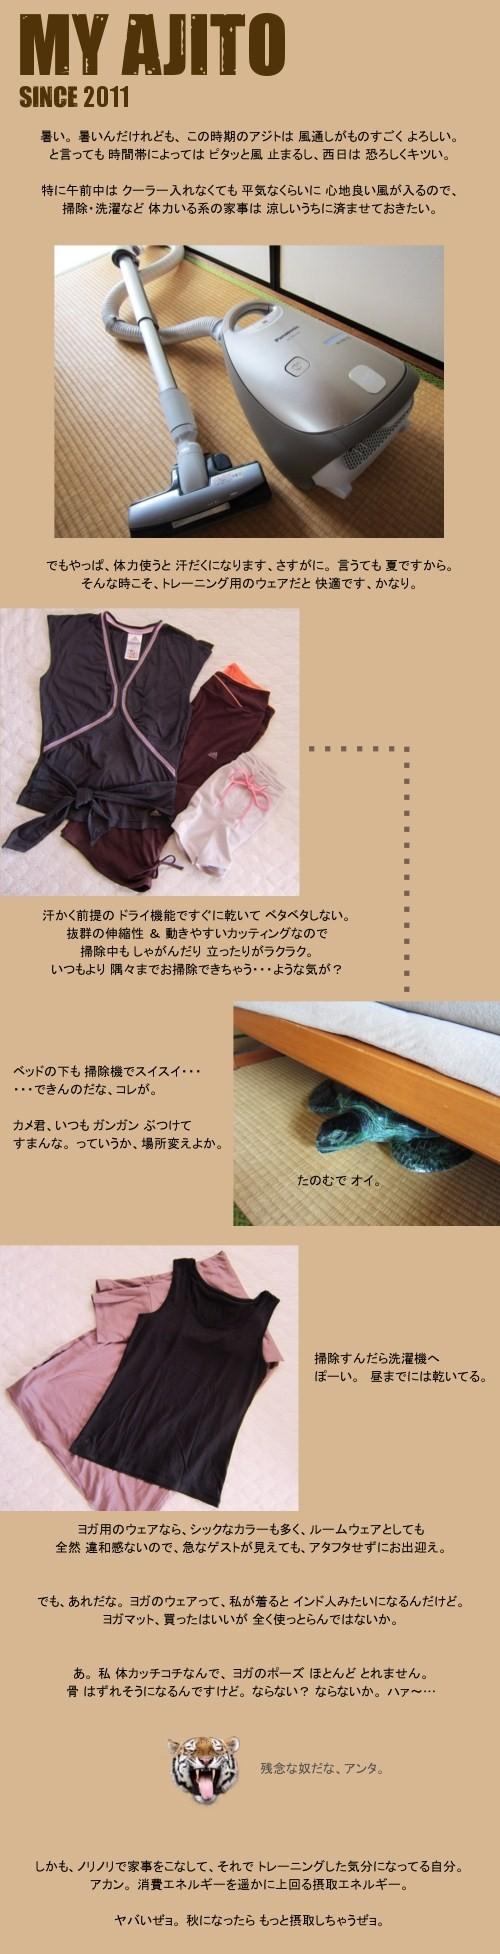 su_t_01.jpg